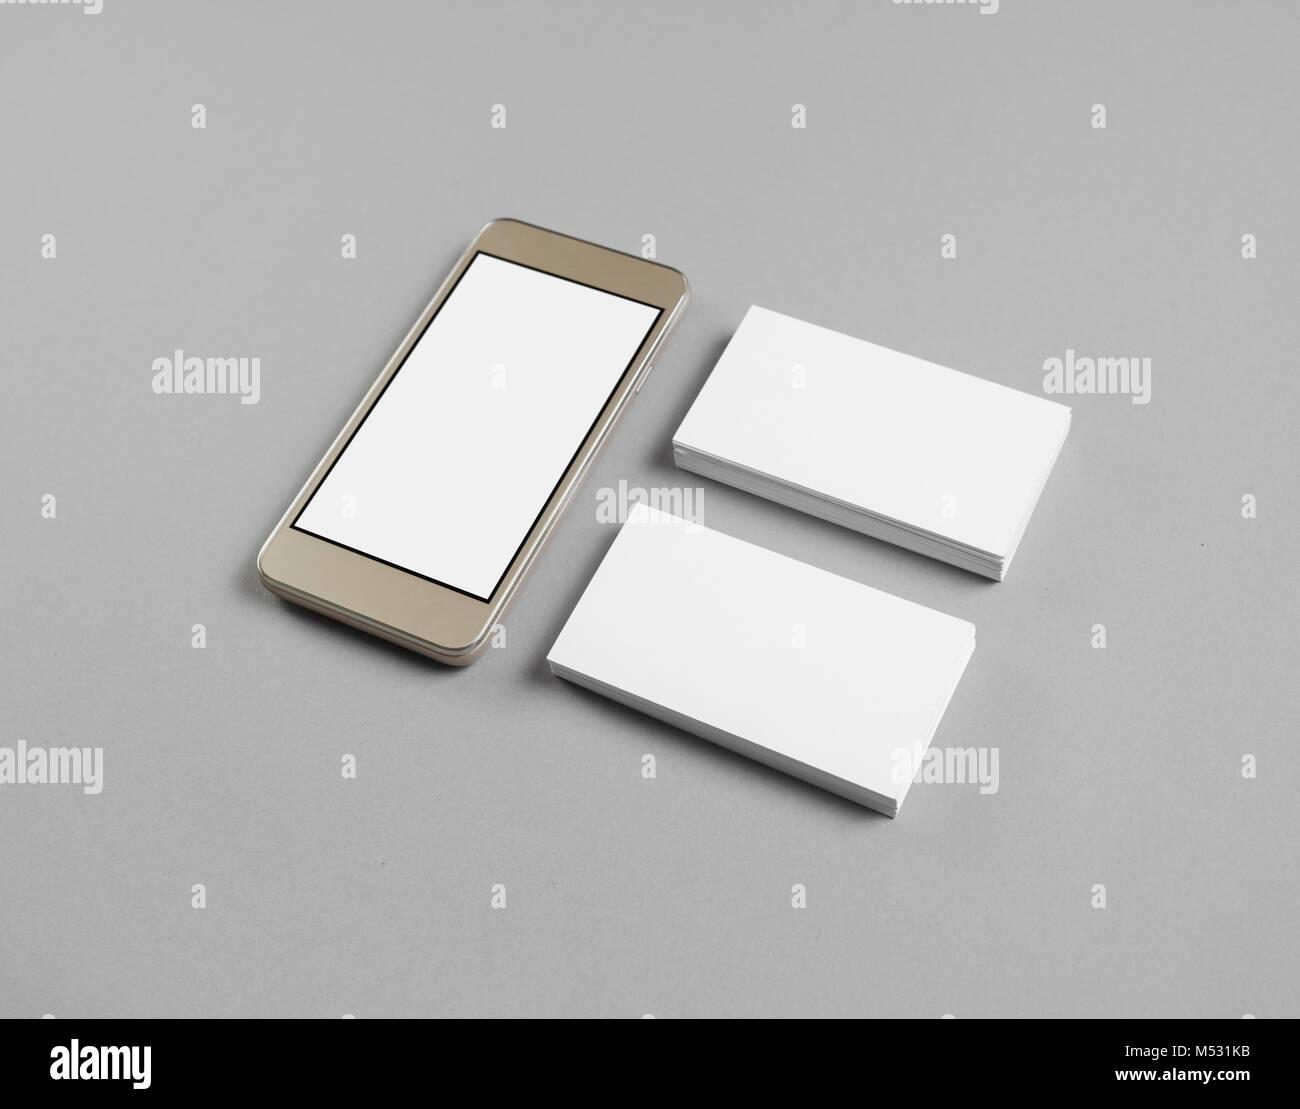 Smartphone, business cards Stock Photo: 175244143 - Alamy